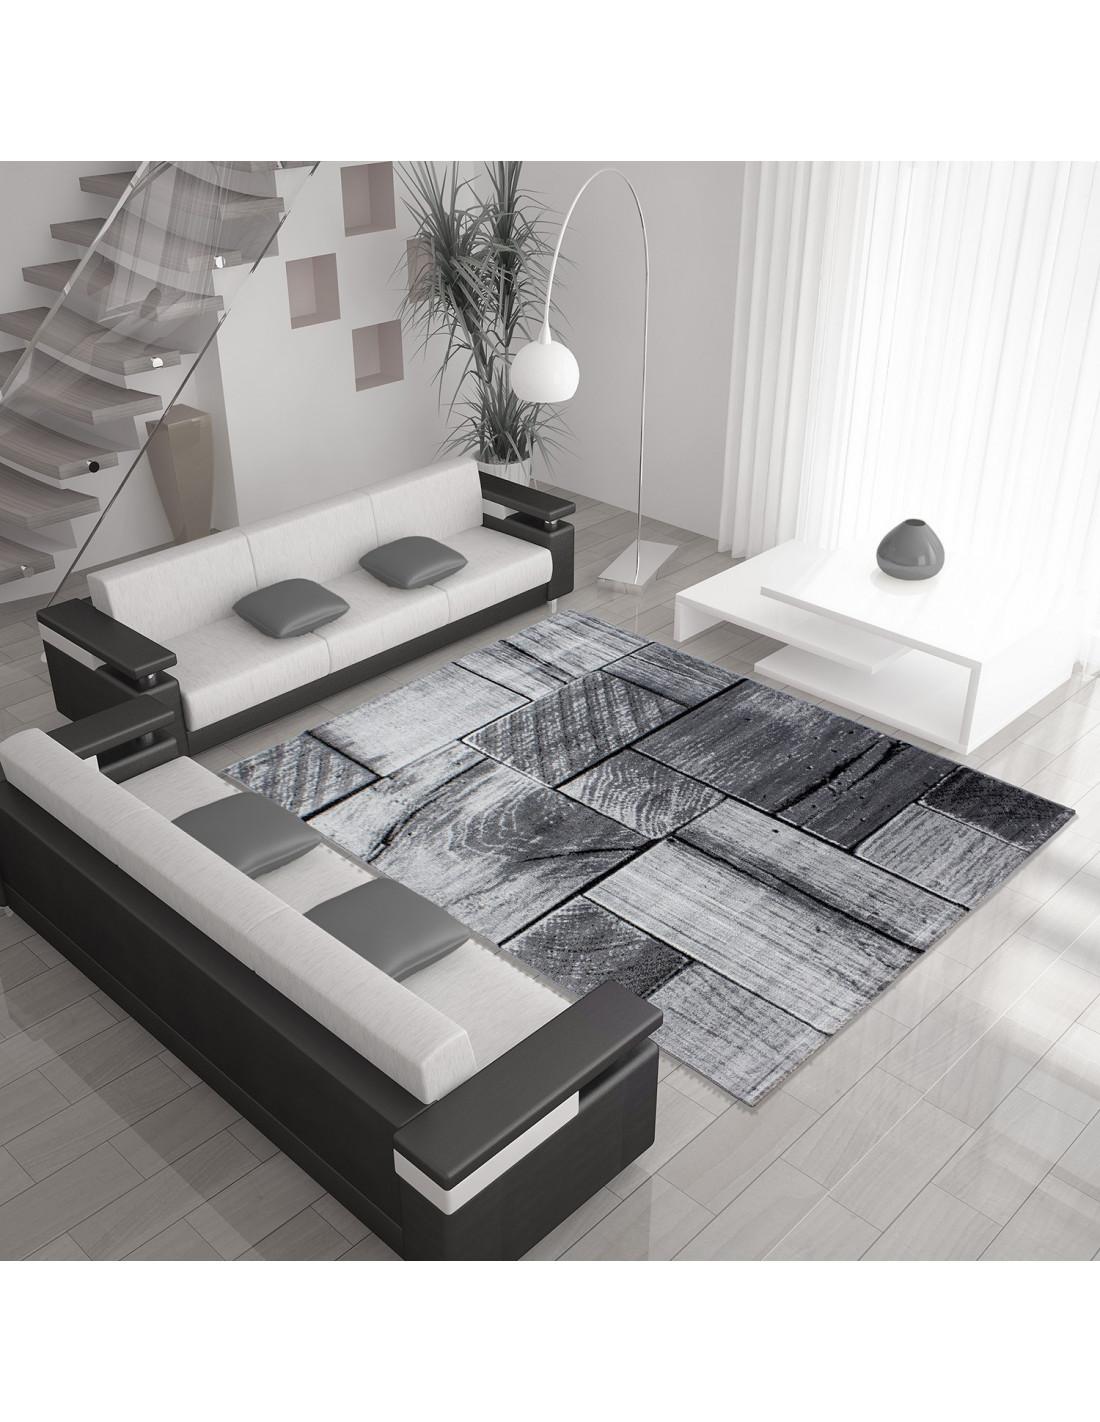 Modern designer living room rug with wood motif PARMA 9260 black-gray